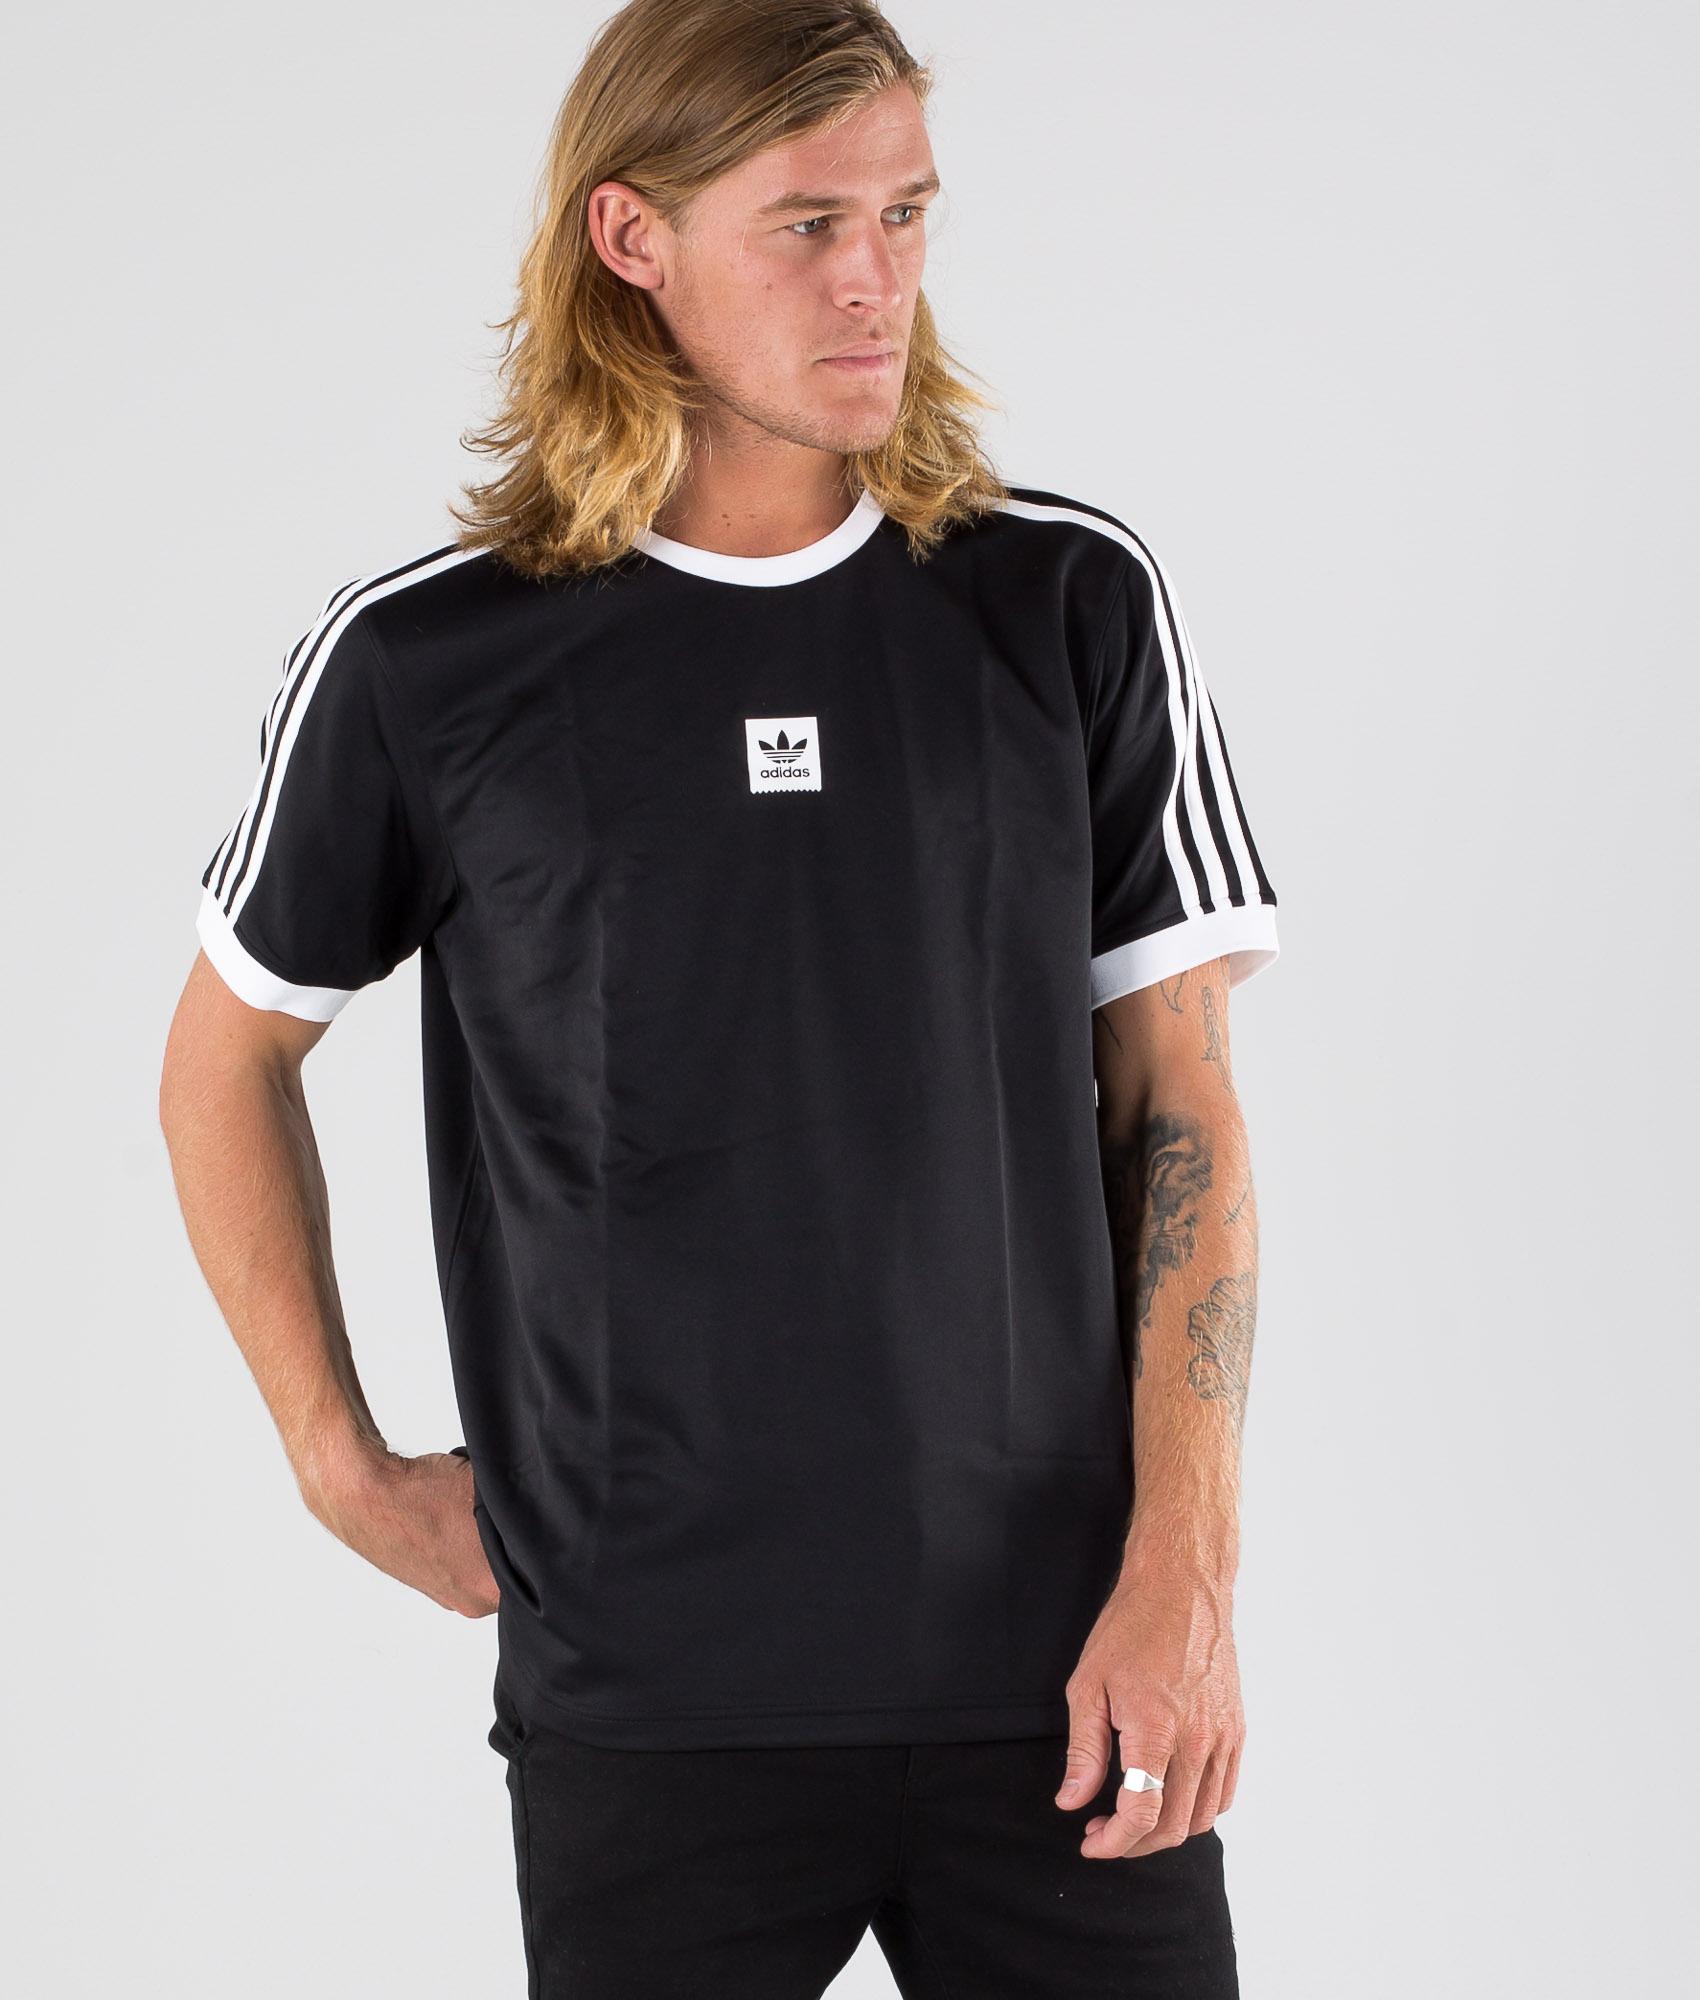 Adidas Skateboarding Club Jersey T shirt BlackWhite